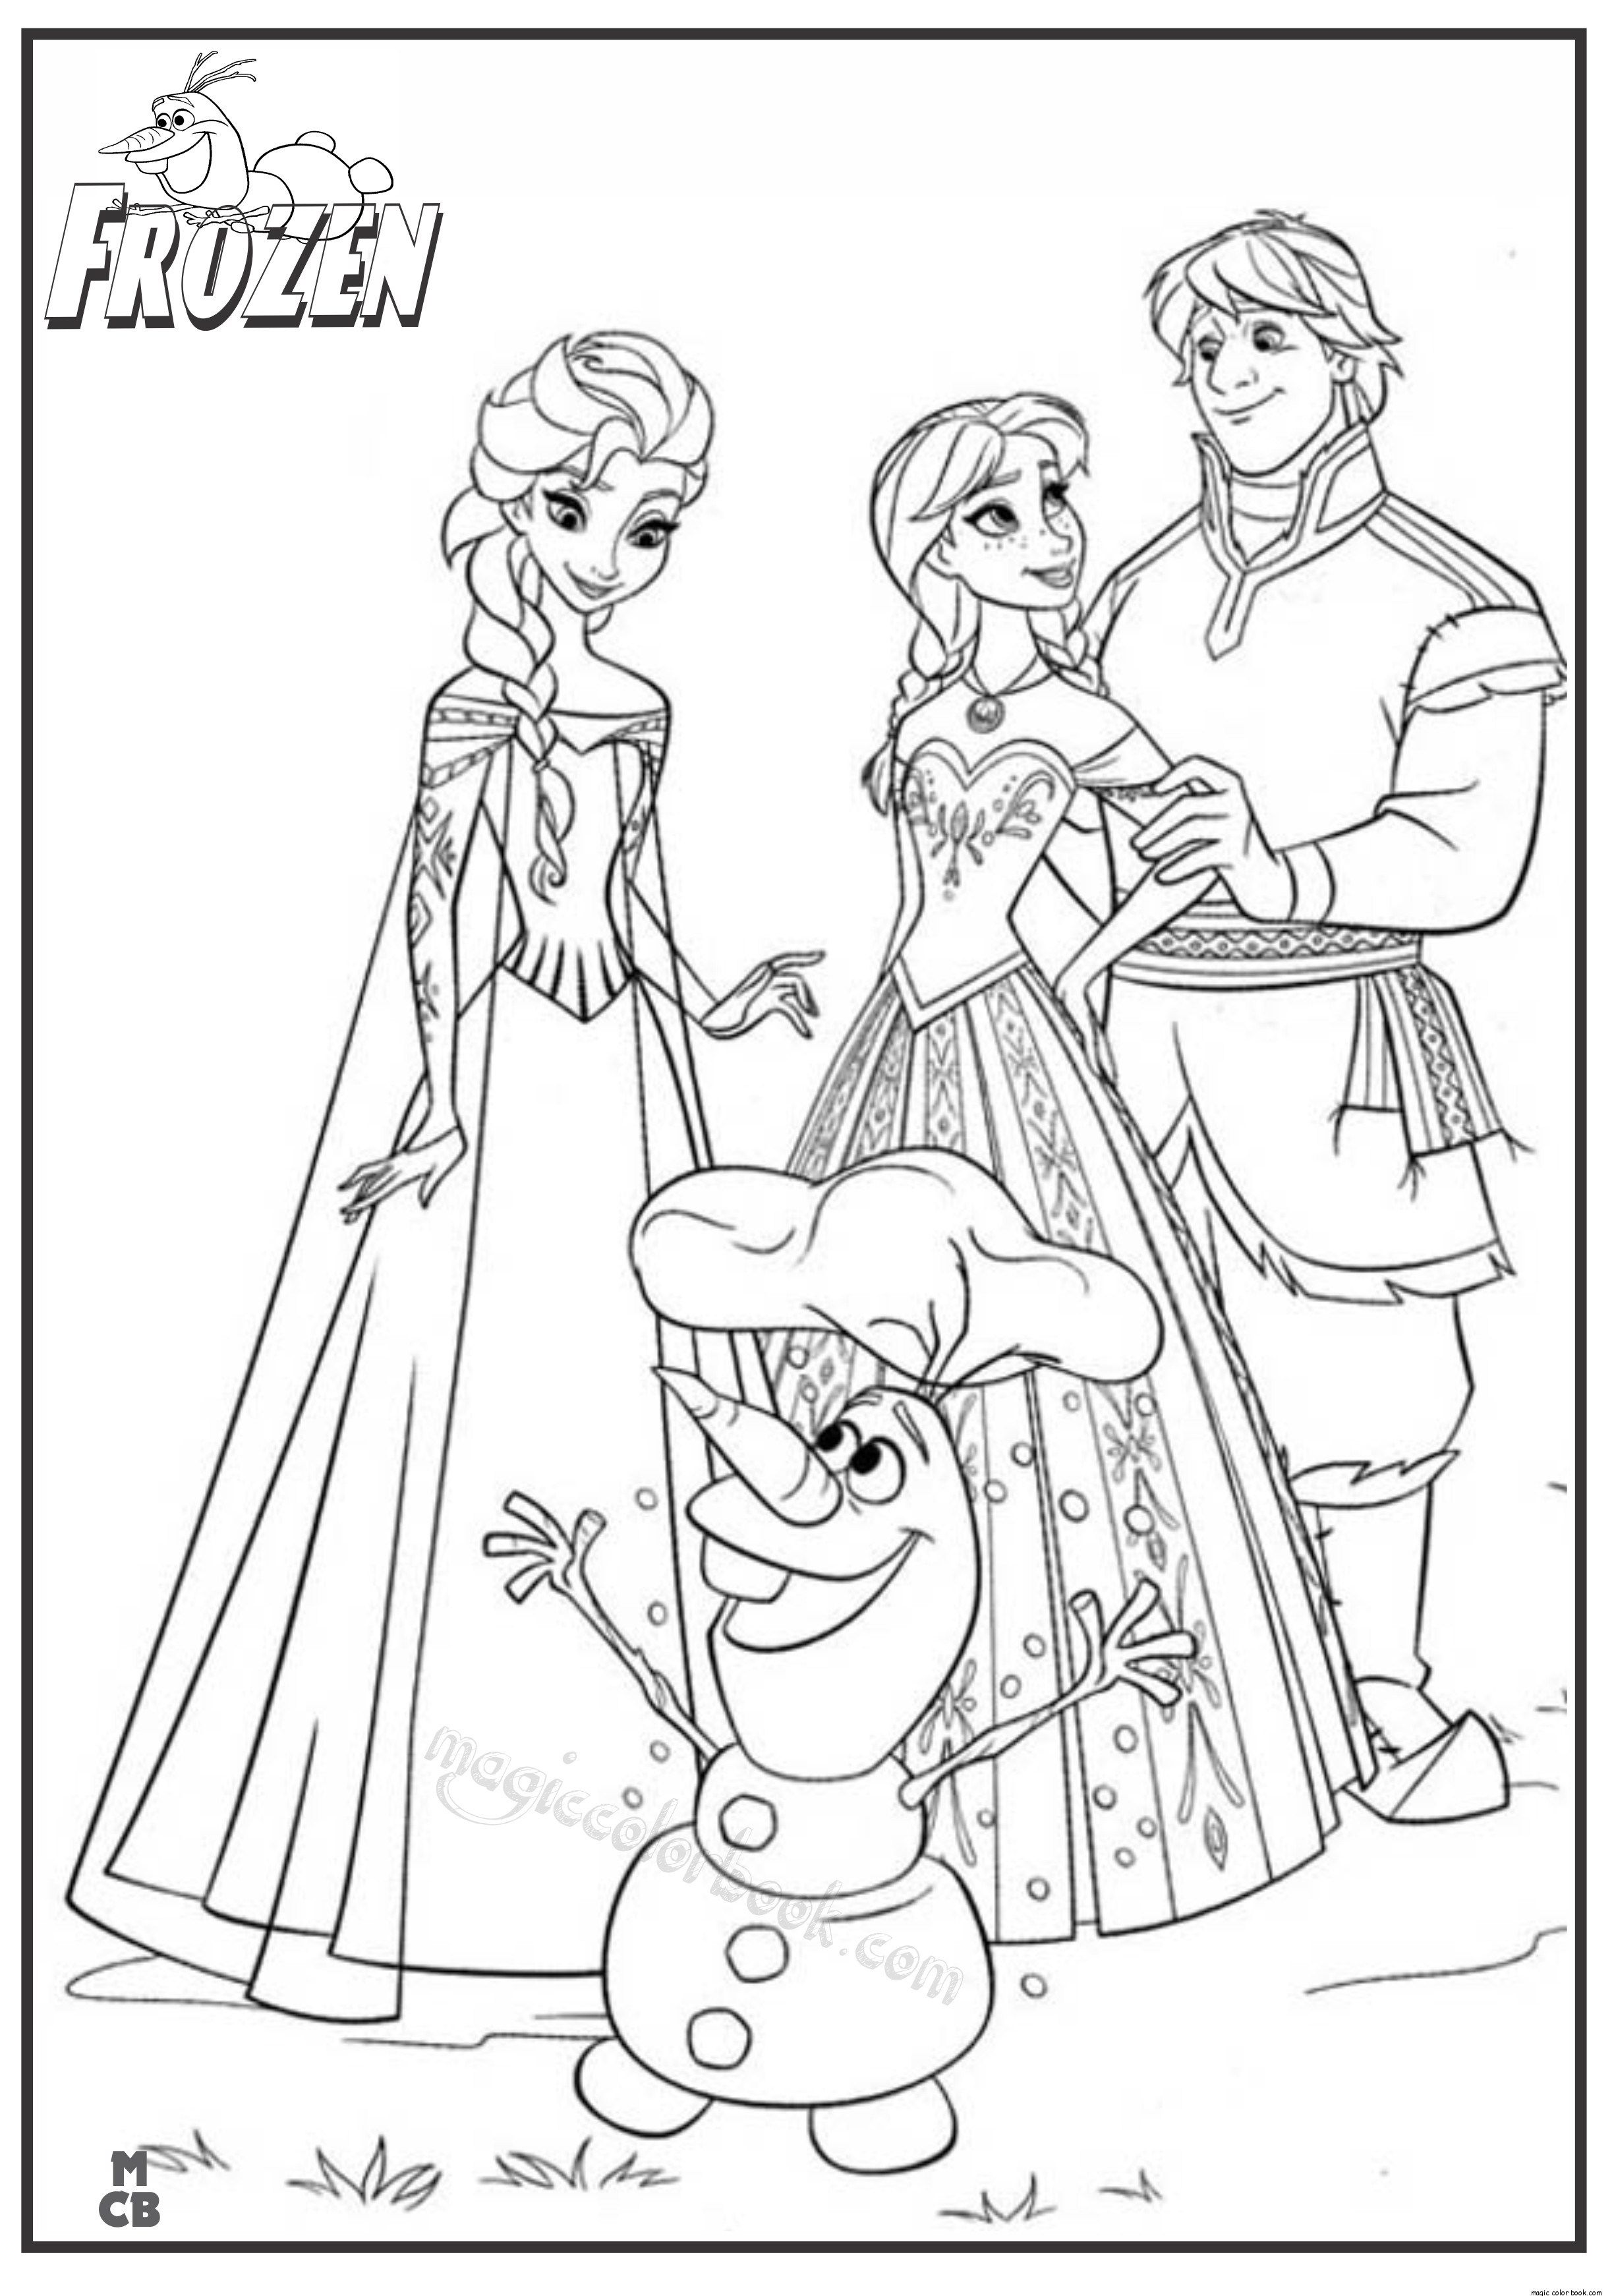 24 Excellent Picture Of Frozen Coloring Pages Free Davemelillo Com Elsa Coloring Pages Disney Princess Coloring Pages Disney Coloring Pages